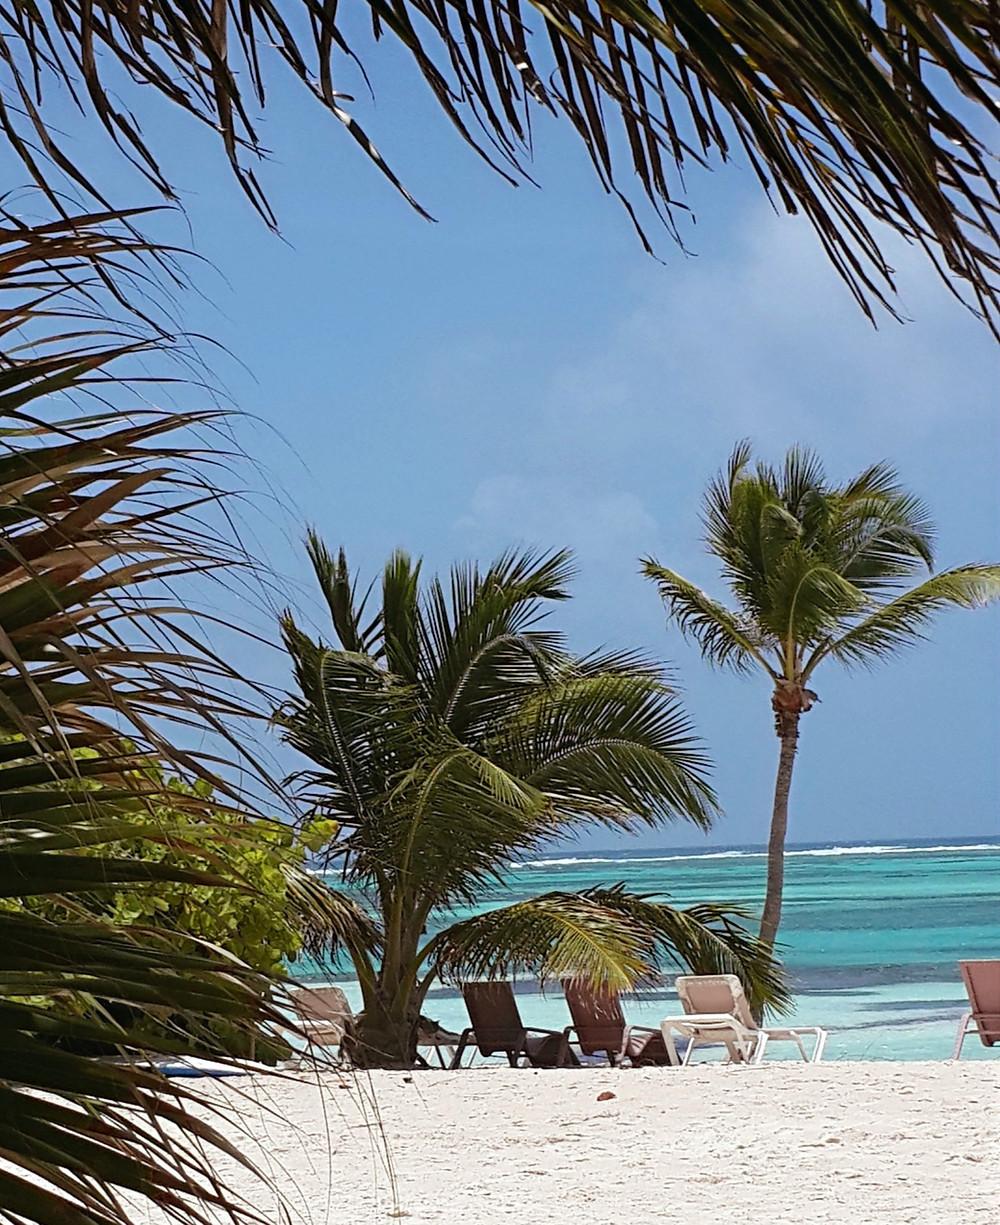 Playa Blanca Punta Cana